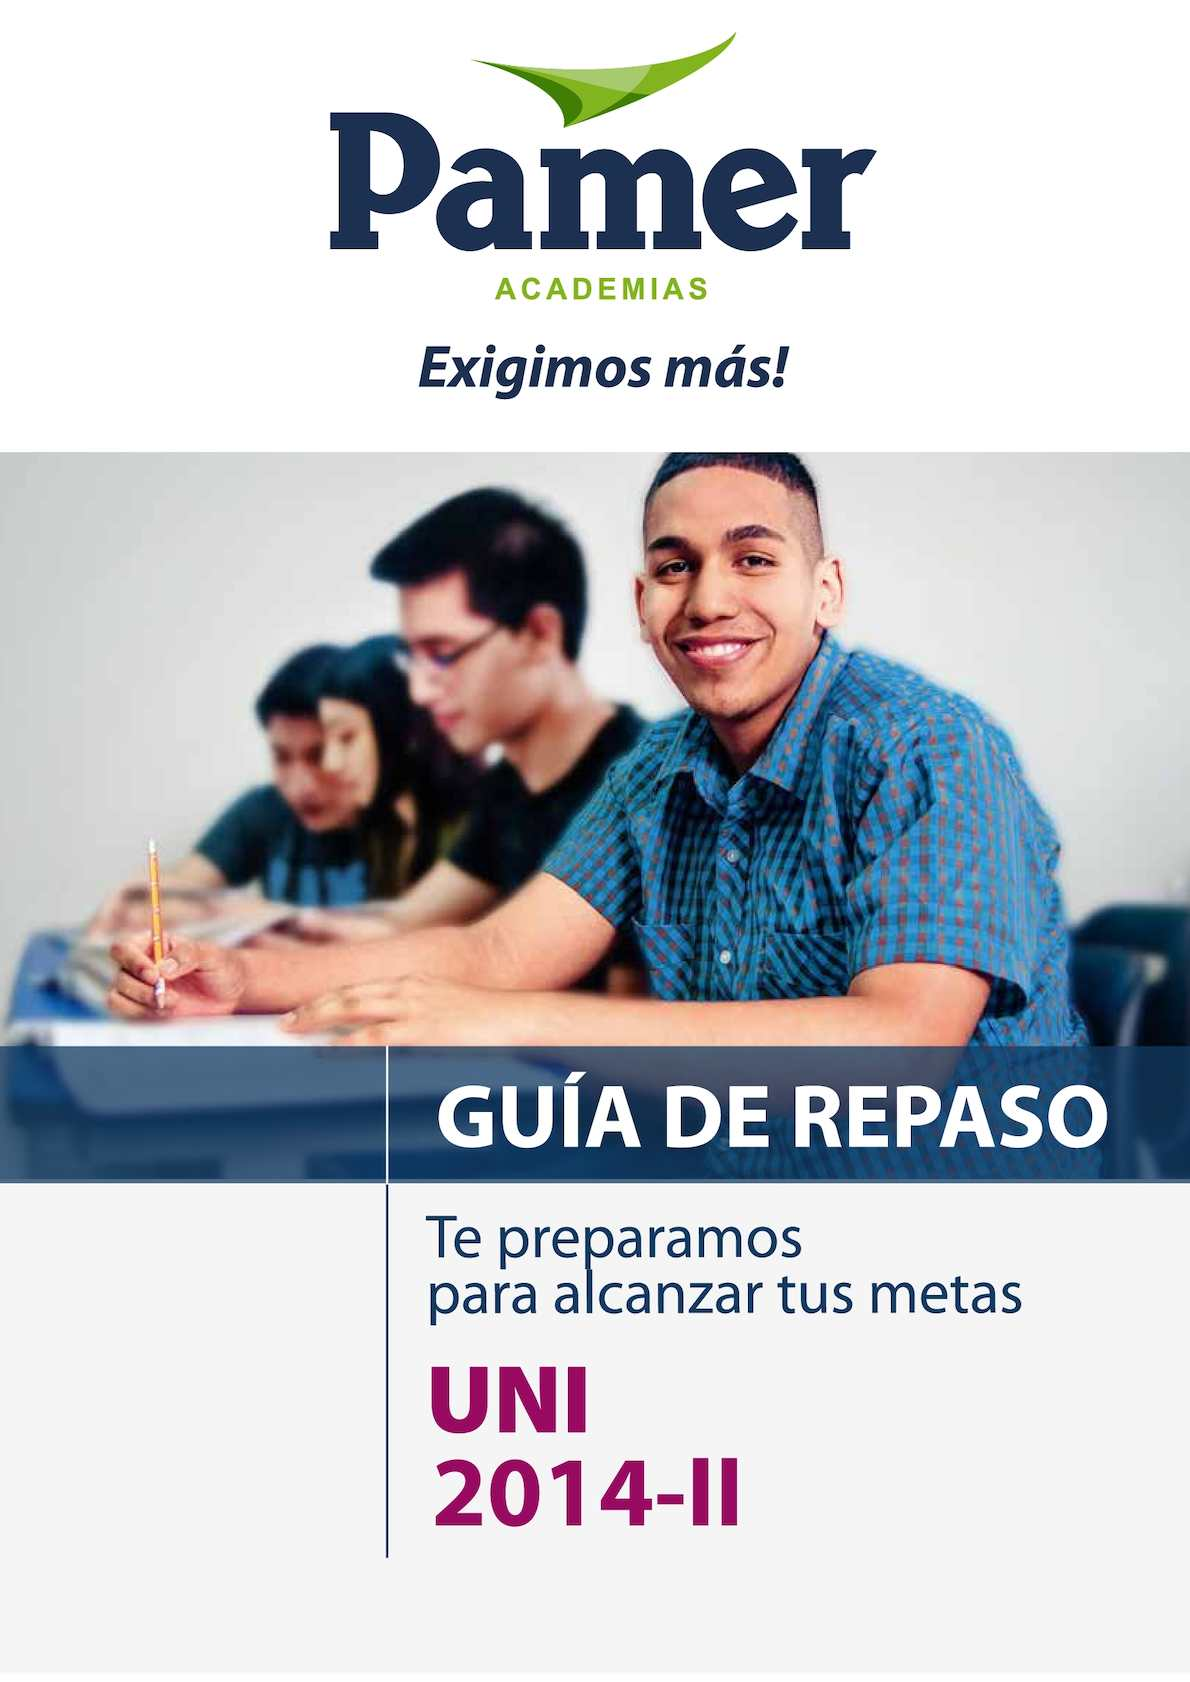 12bb1b98baf9 Calaméo - REPASO PAMER UNI 2014 - II